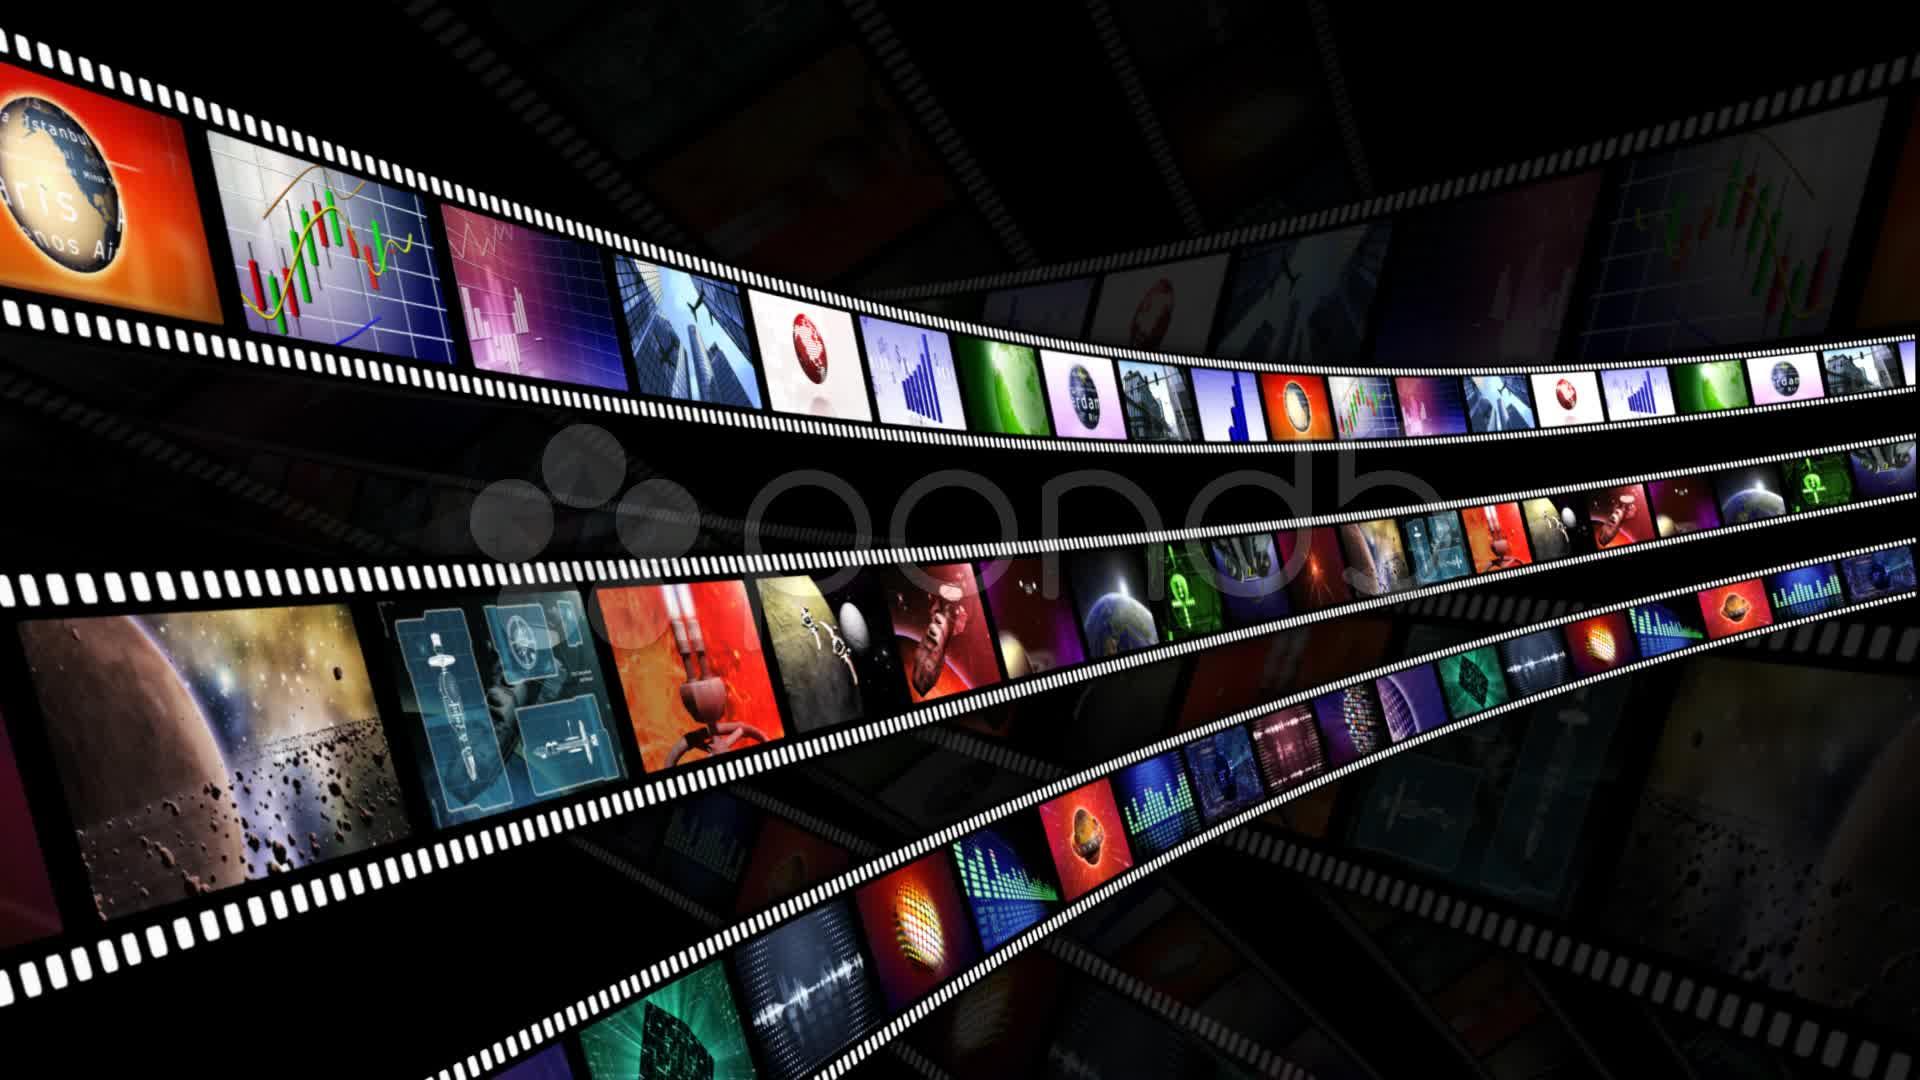 [48+] Film Strip Wallpaper on WallpaperSafari